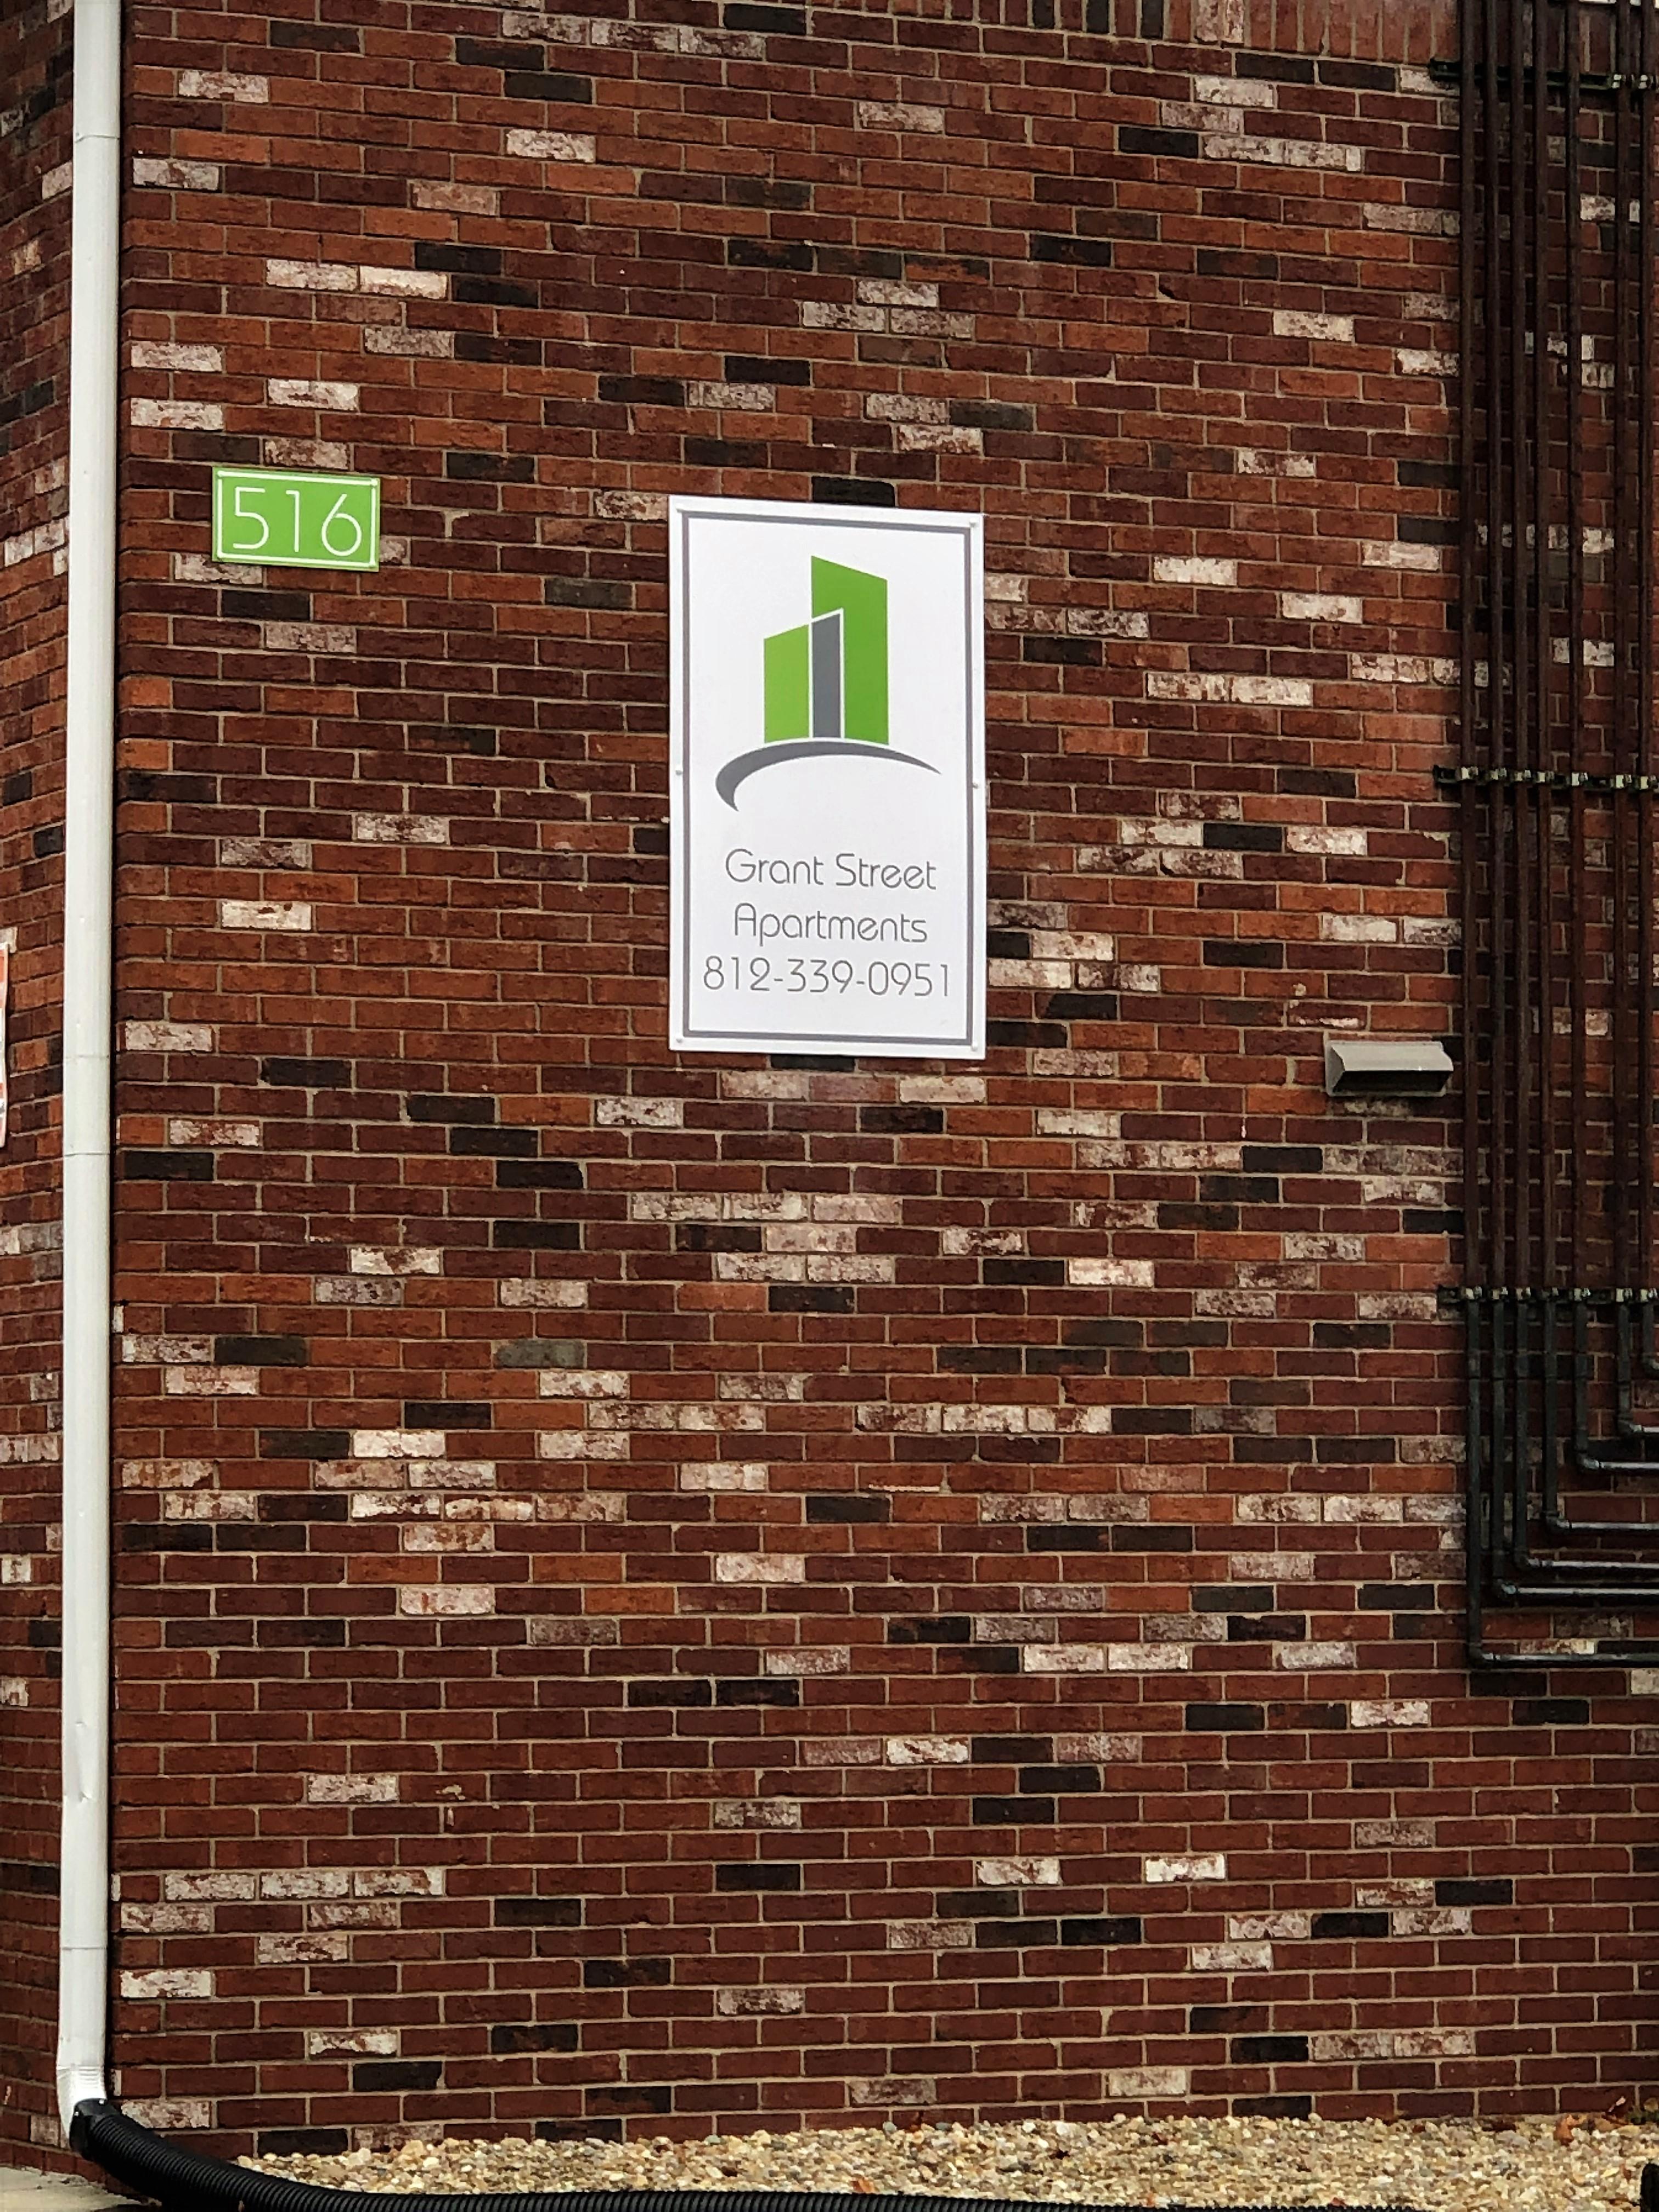 Apartments Near Indiana University Grant Street Apartments for Indiana University Students in Bloomington, IN